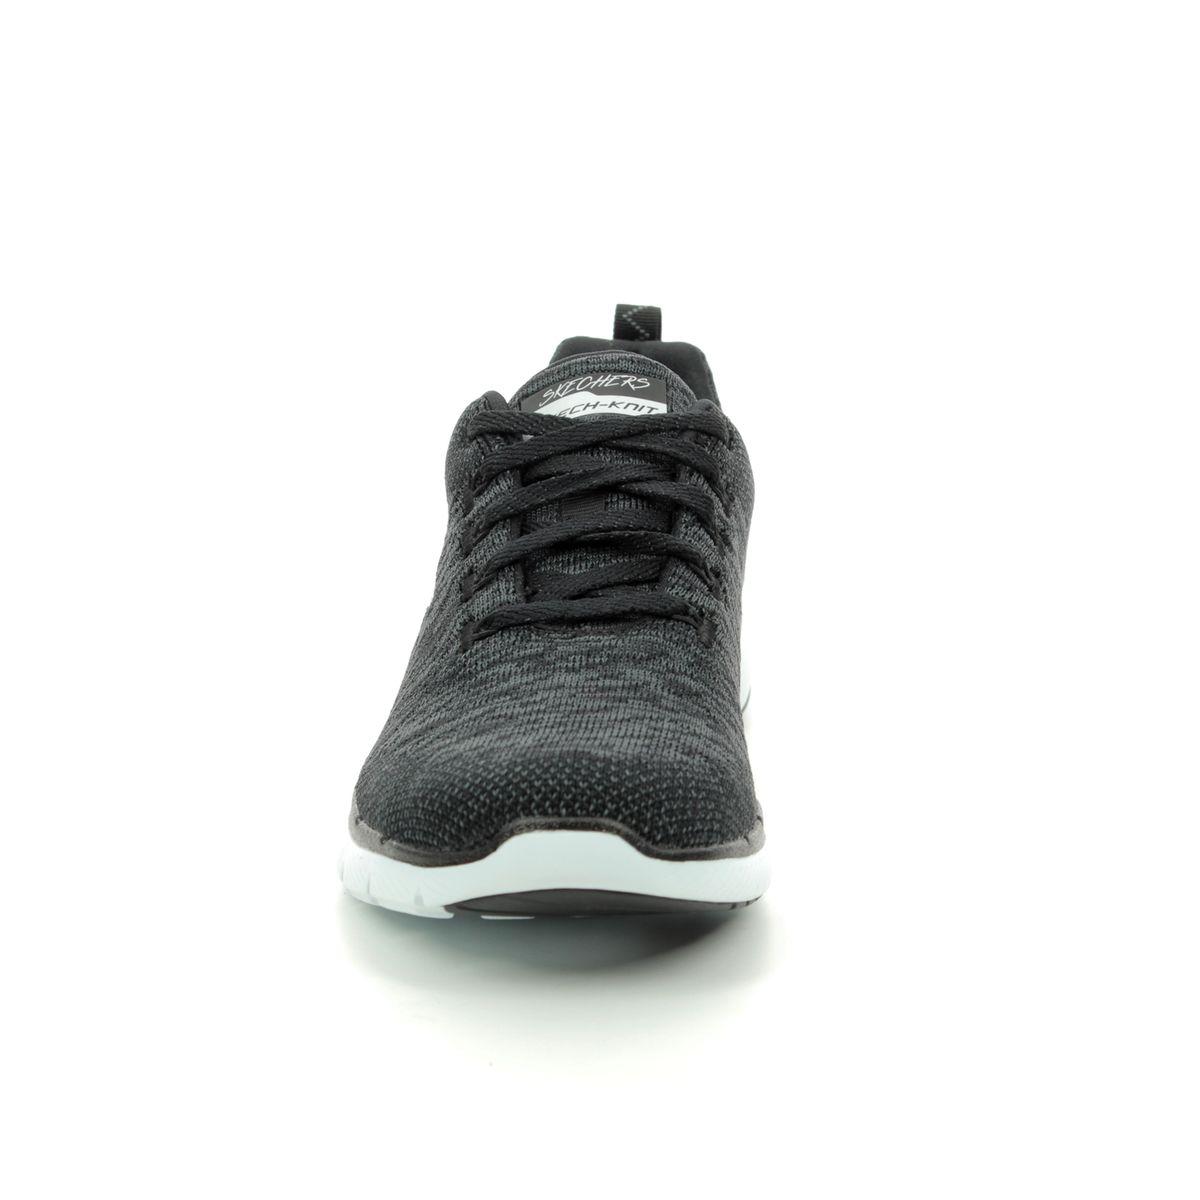 3fcd1ec242555 13062 Flex Appeal 3 at Begg Shoes & Bags